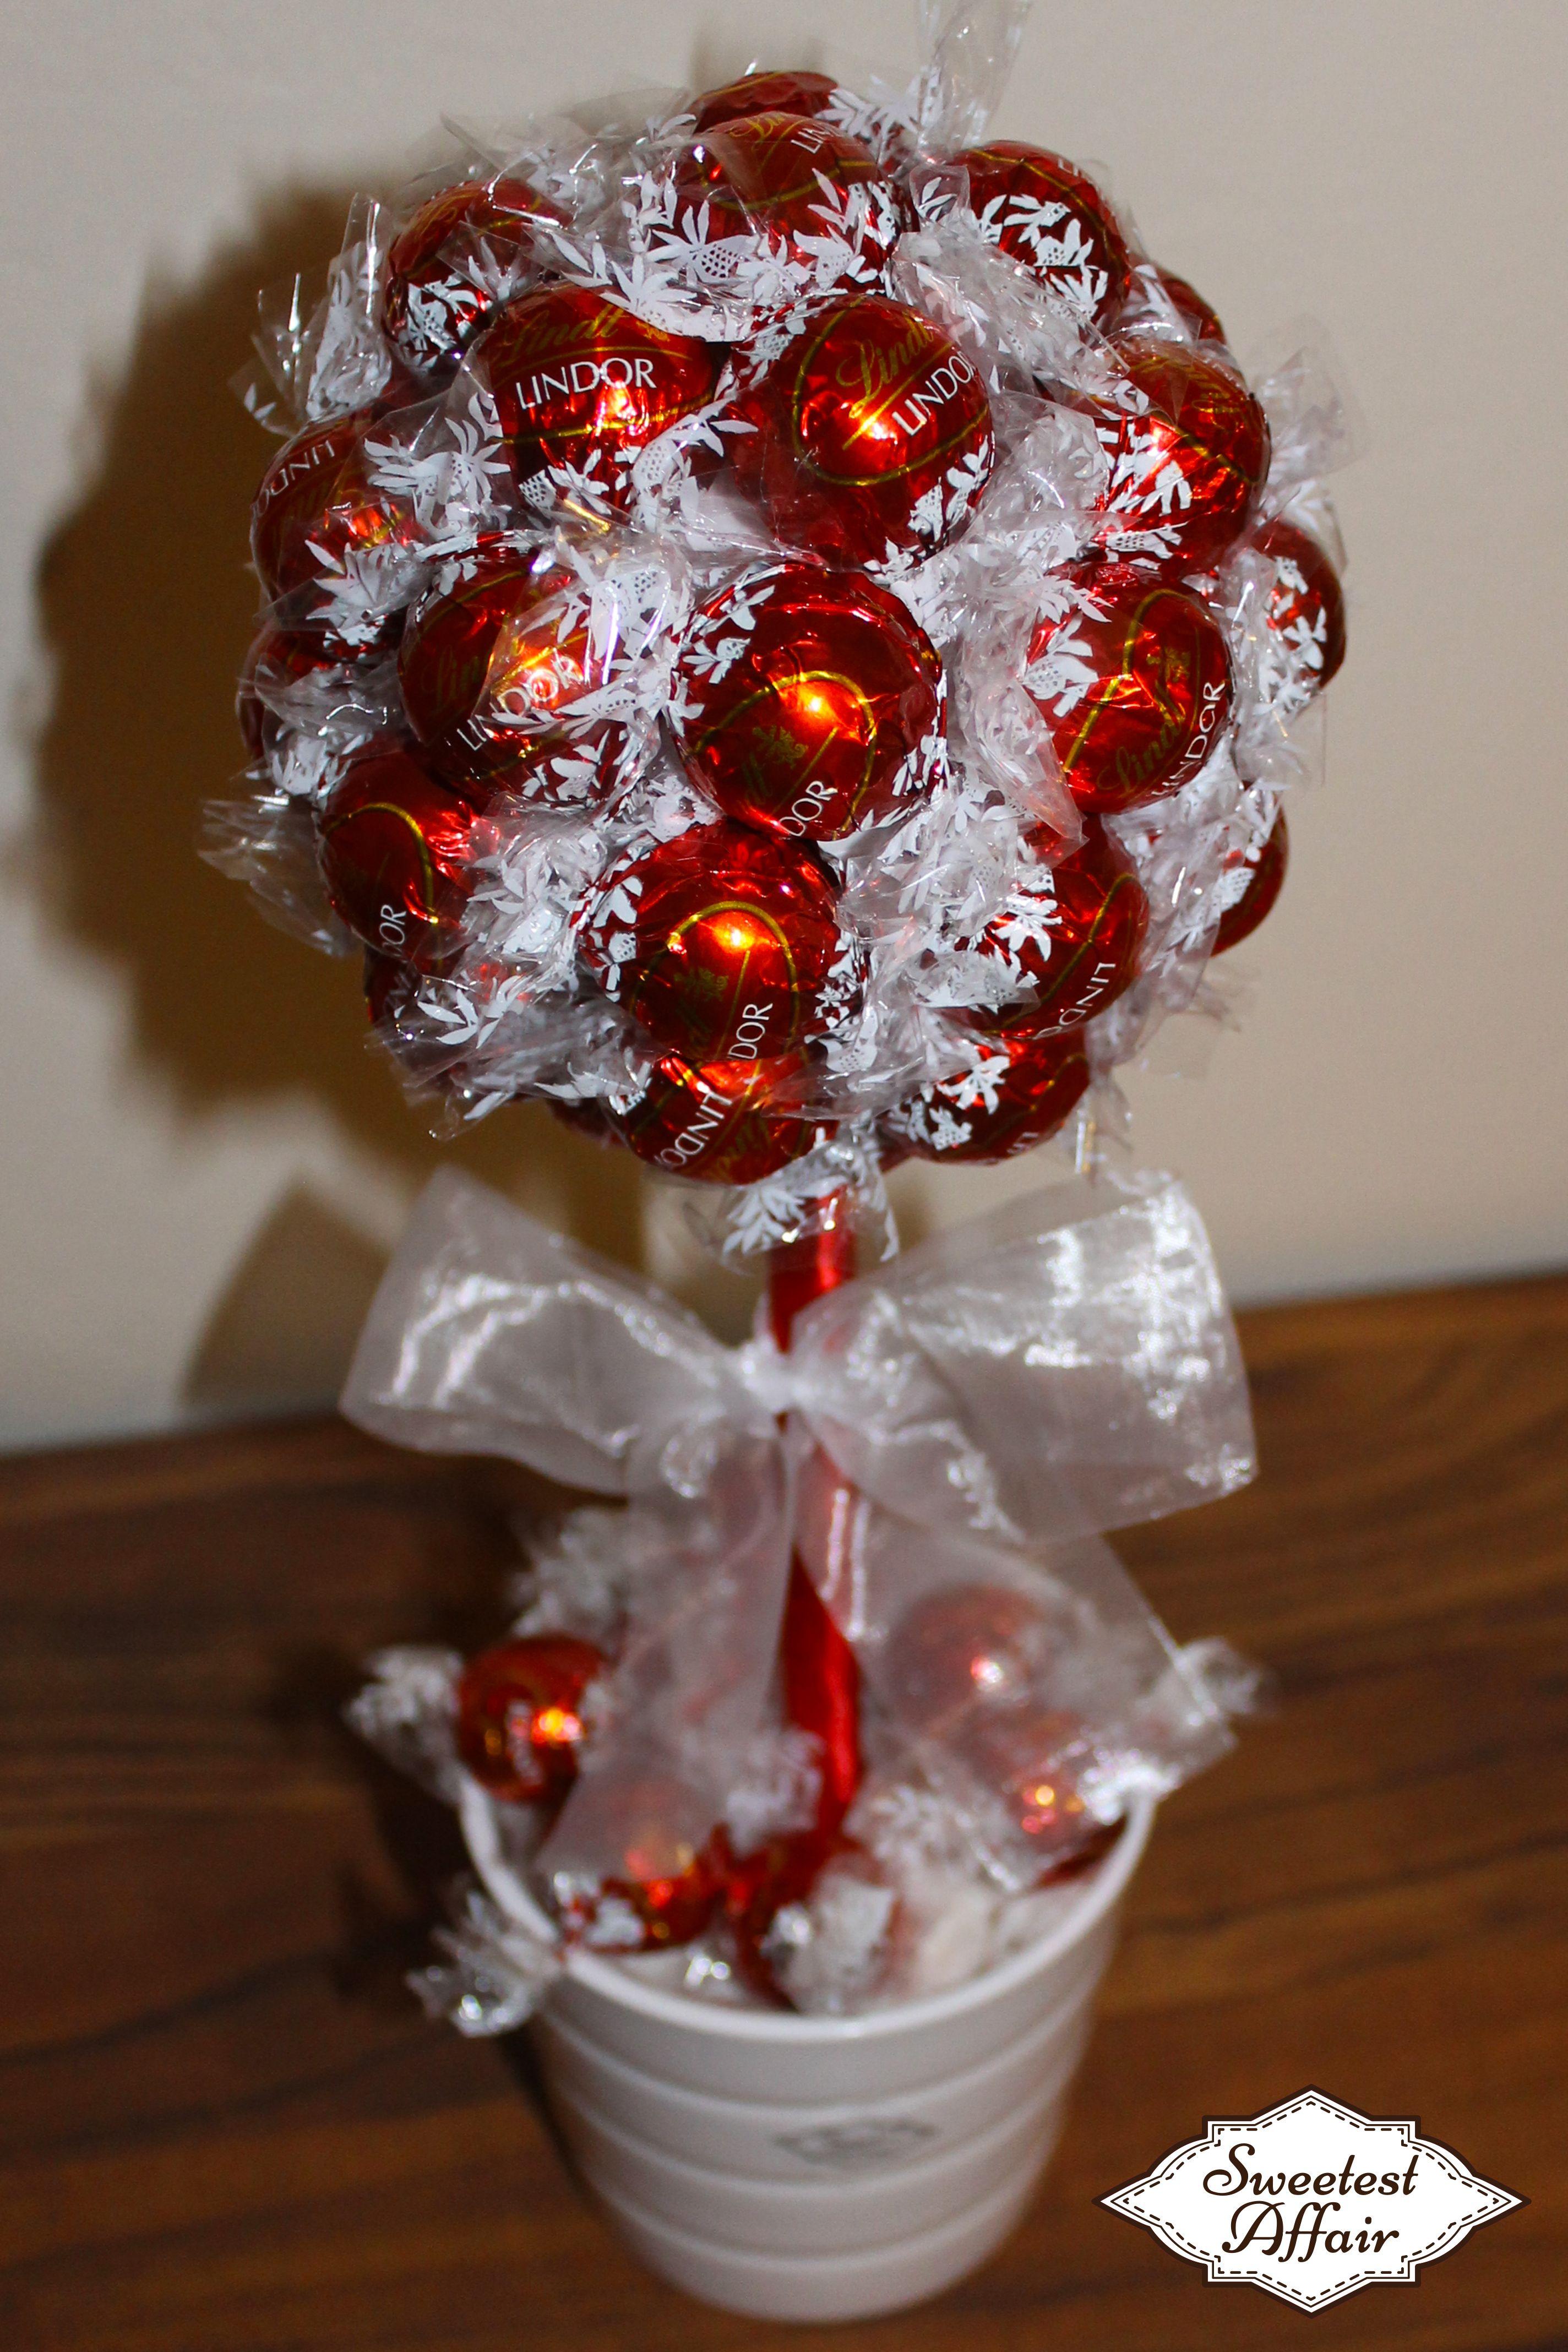 Lindt Lindor Chocolate Truffles Sweet Tree http://www.ebay.co.uk ...